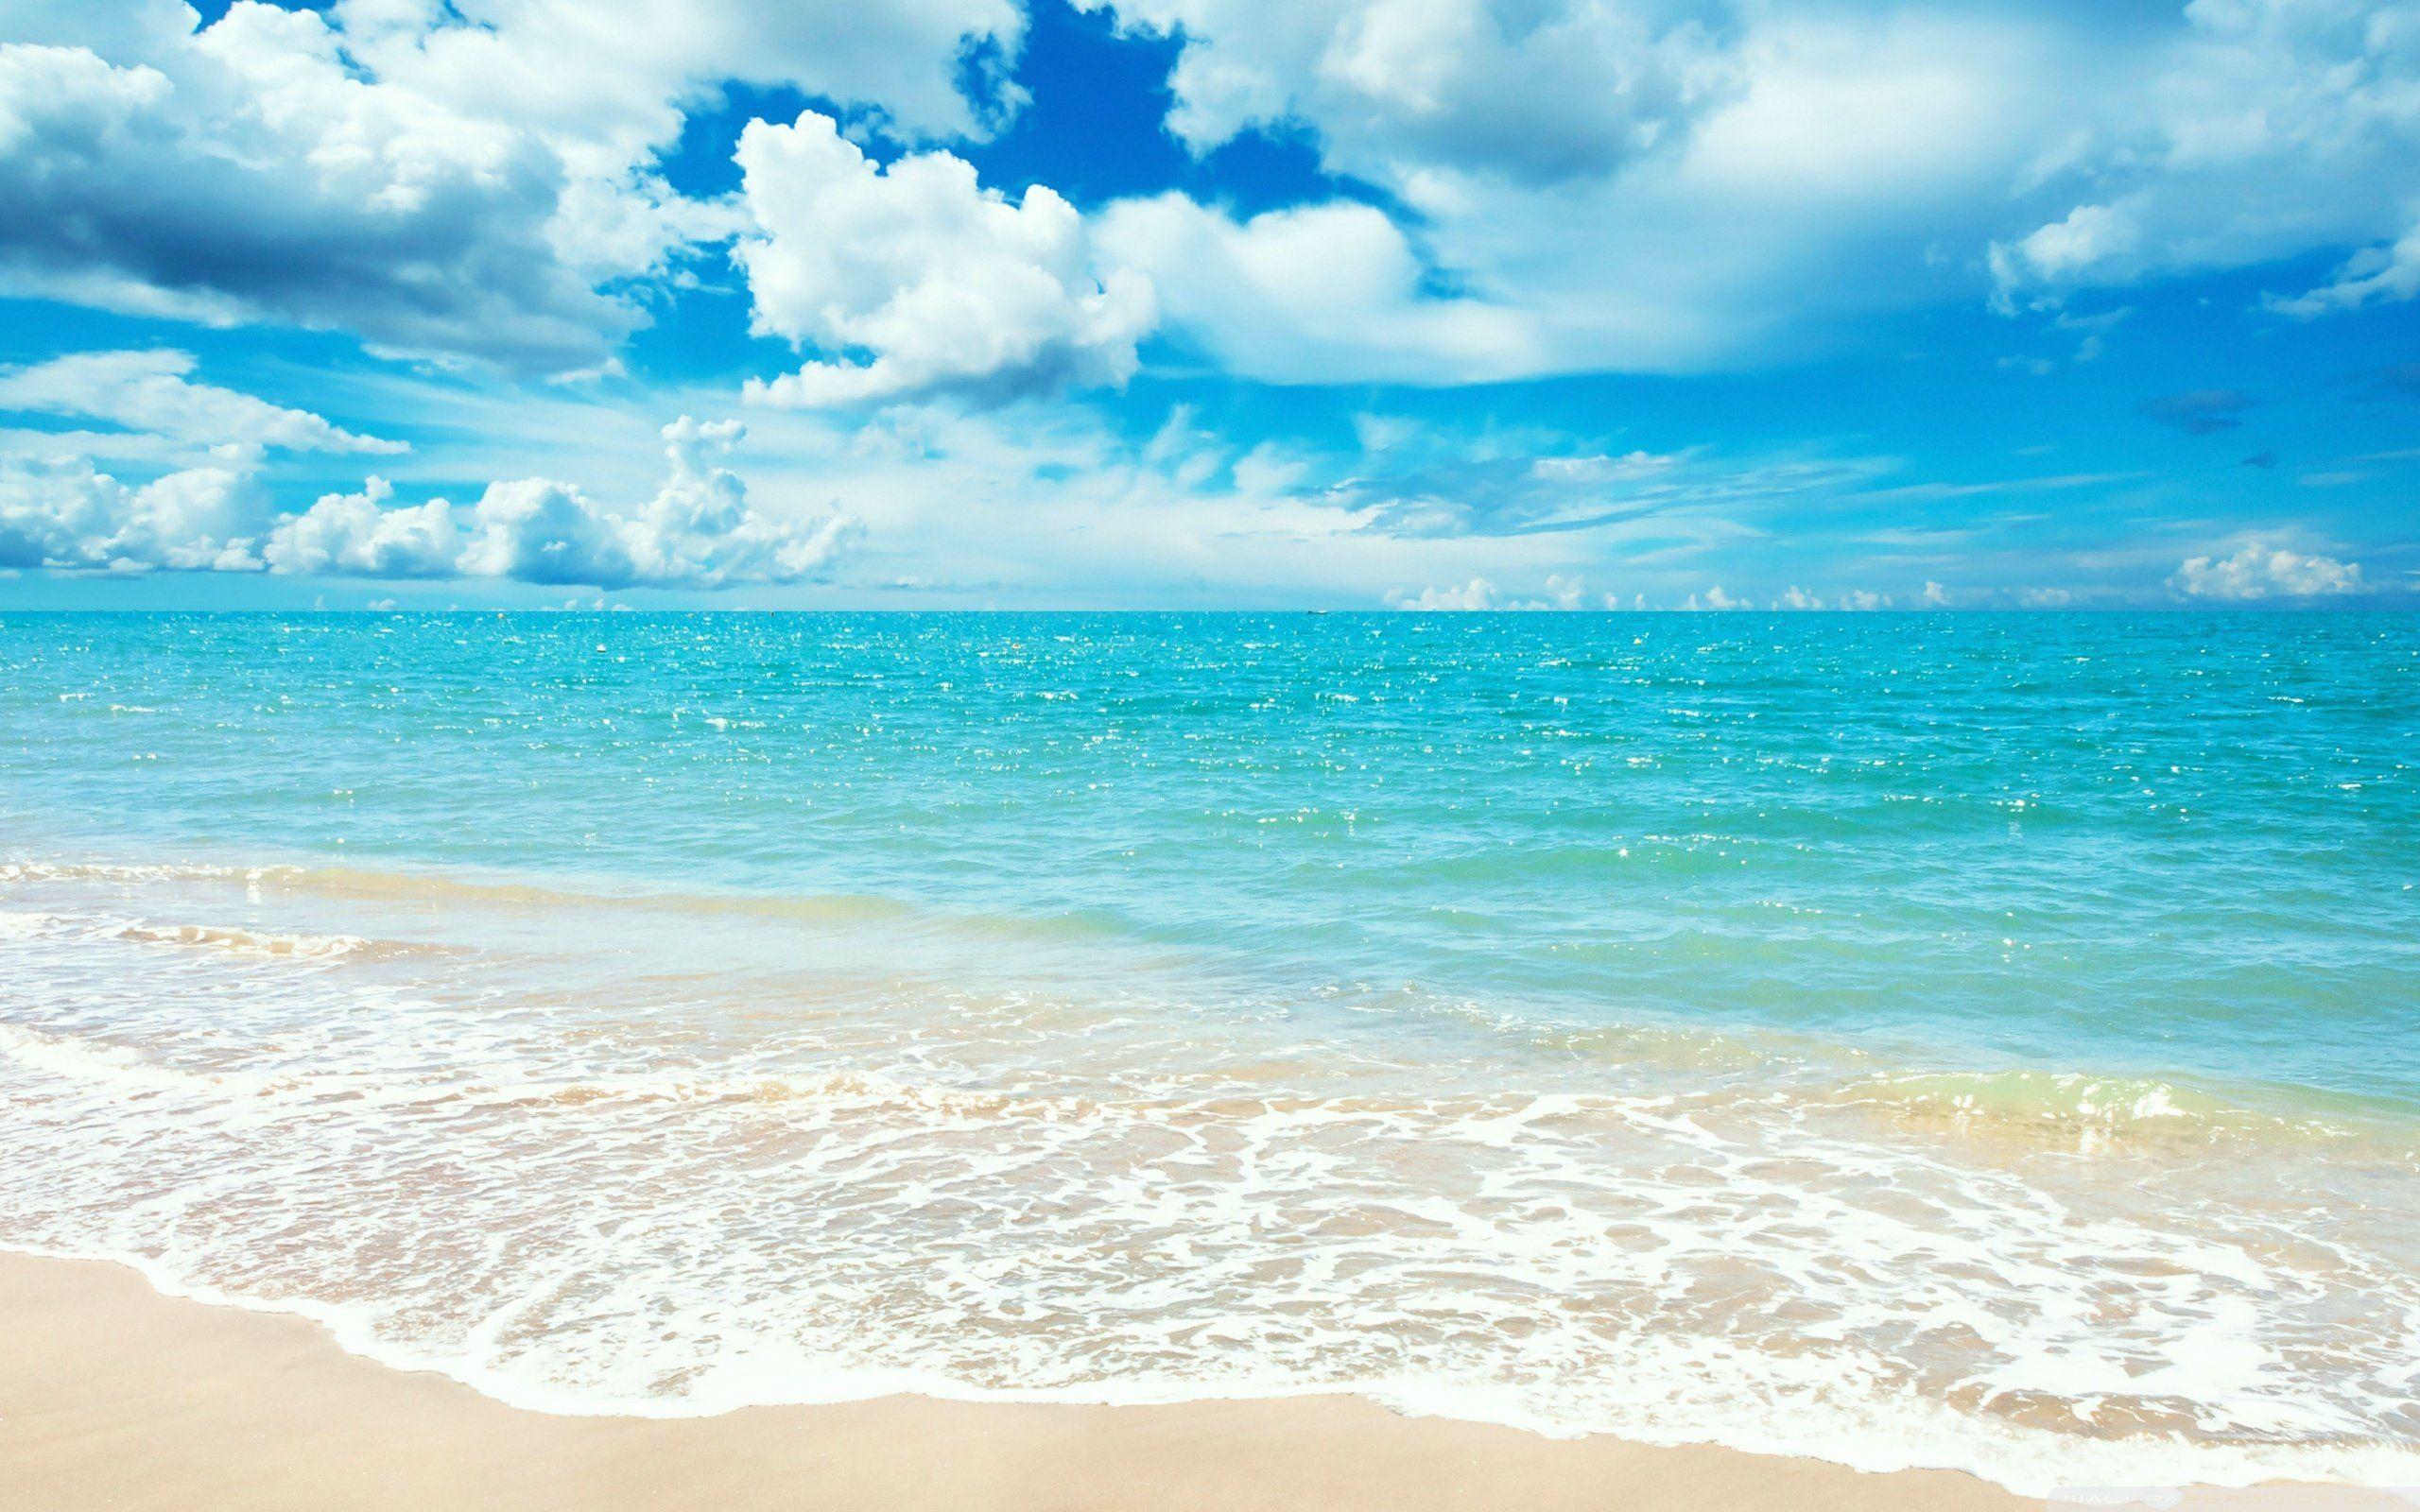 Beach Wallpaper For Mobile And Desktop In Full Hd For